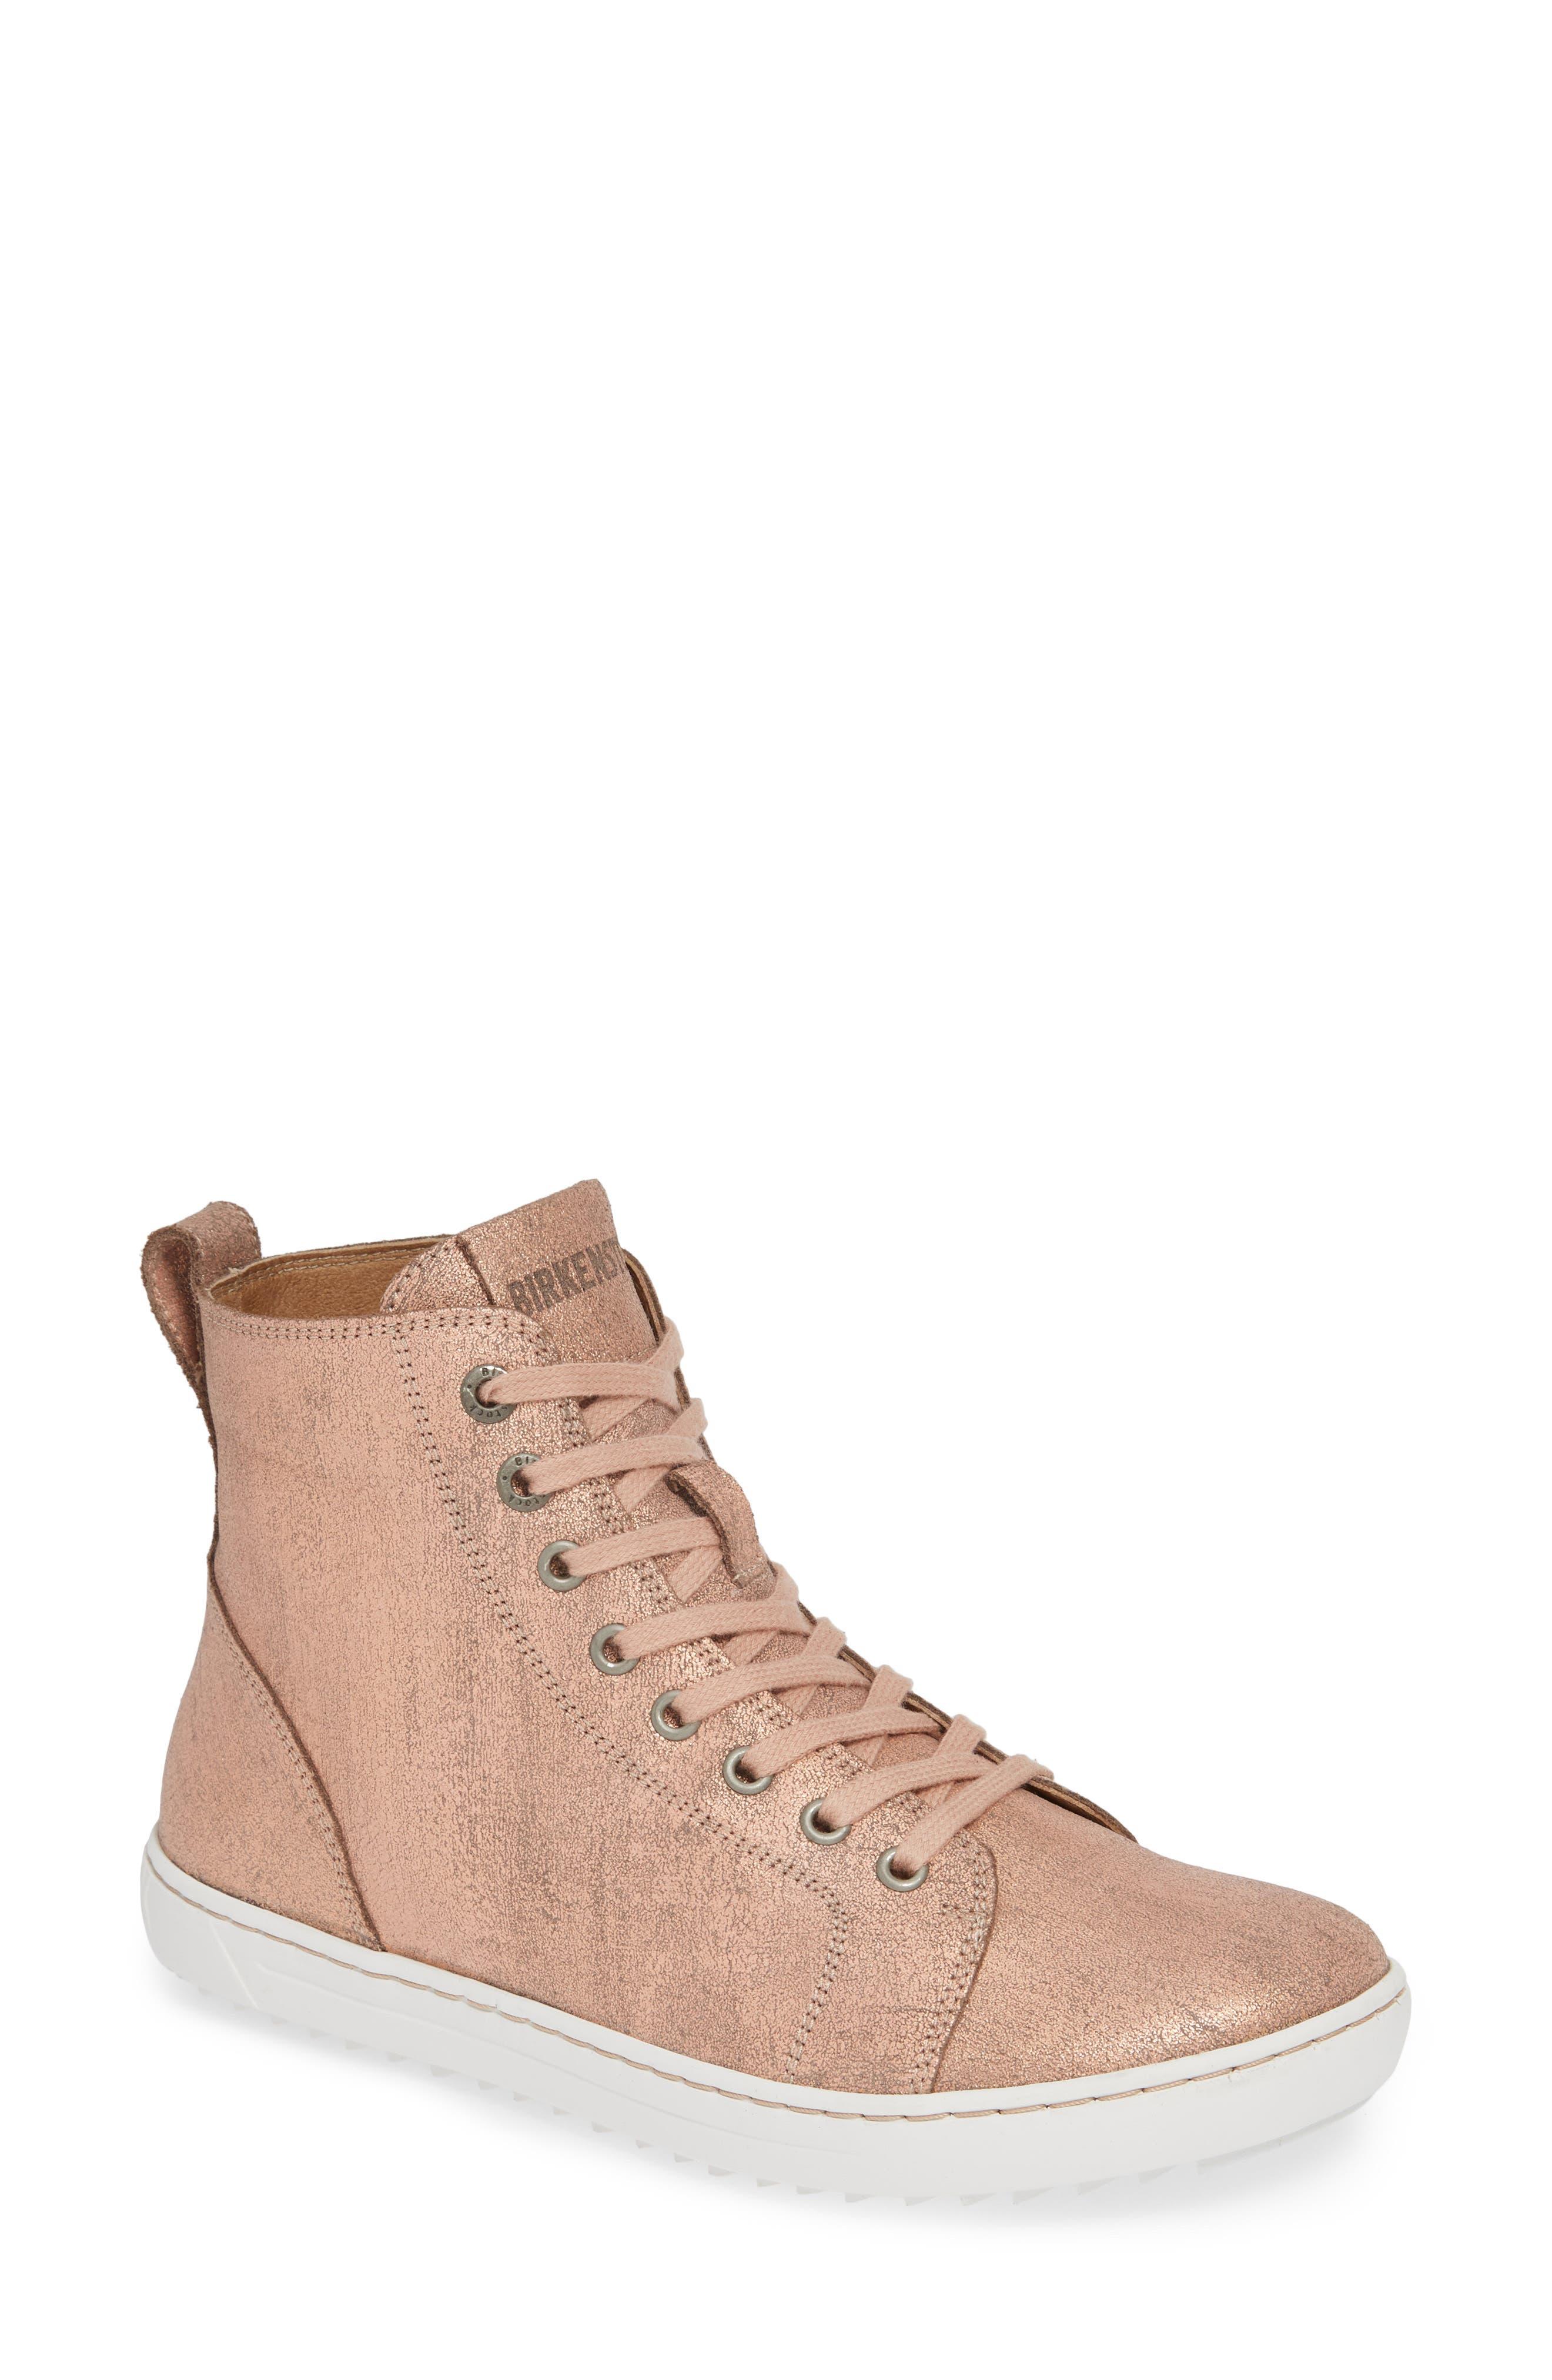 Bartlett High Top Sneaker,                             Main thumbnail 1, color,                             METALLIC ROSE LEATHER